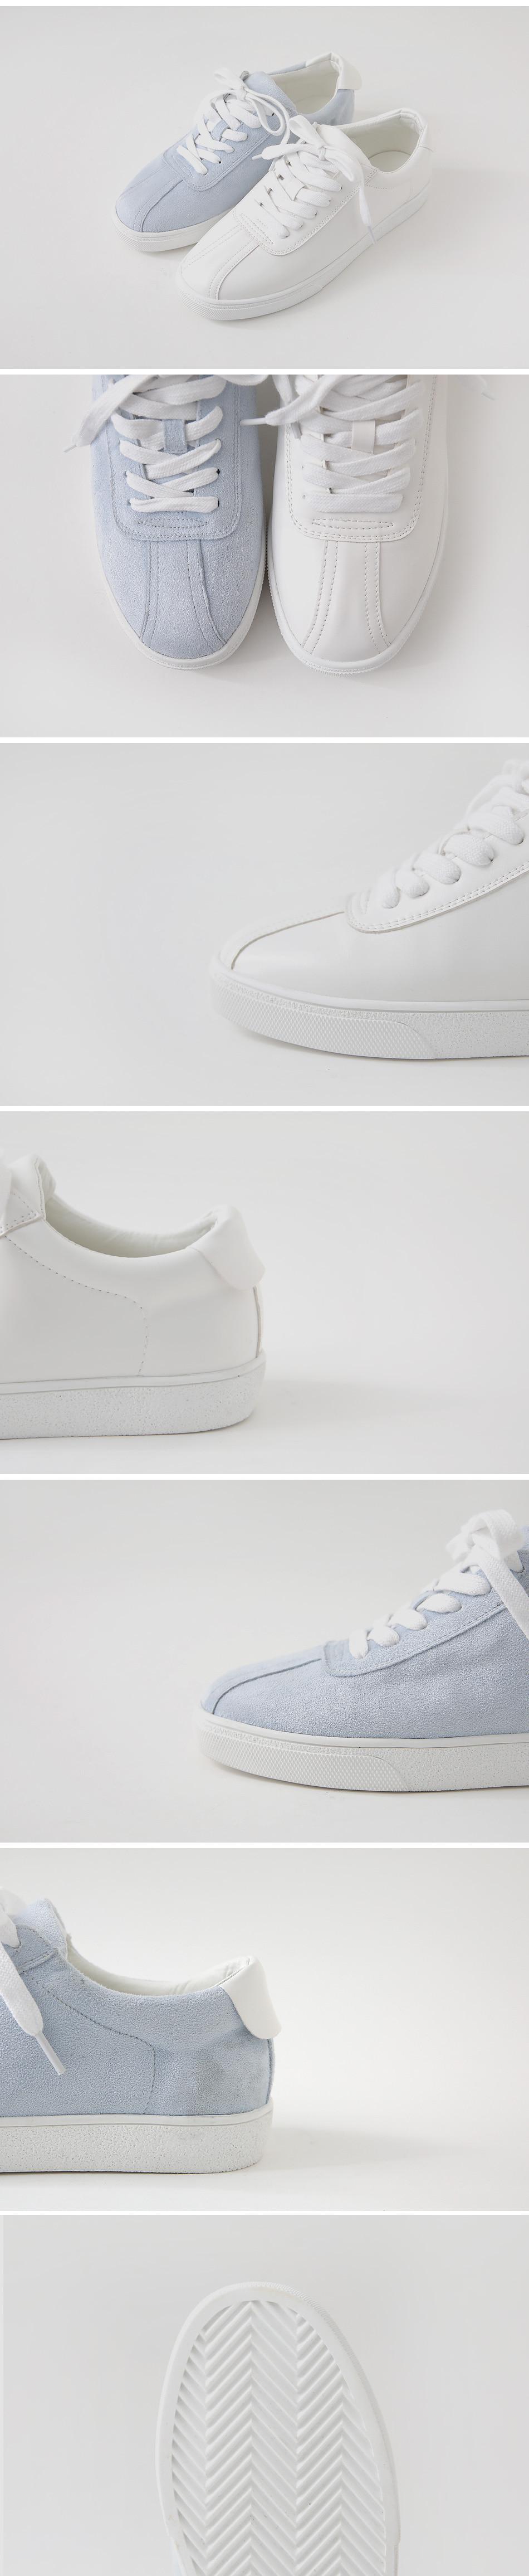 Oxygen sneakers 2cm